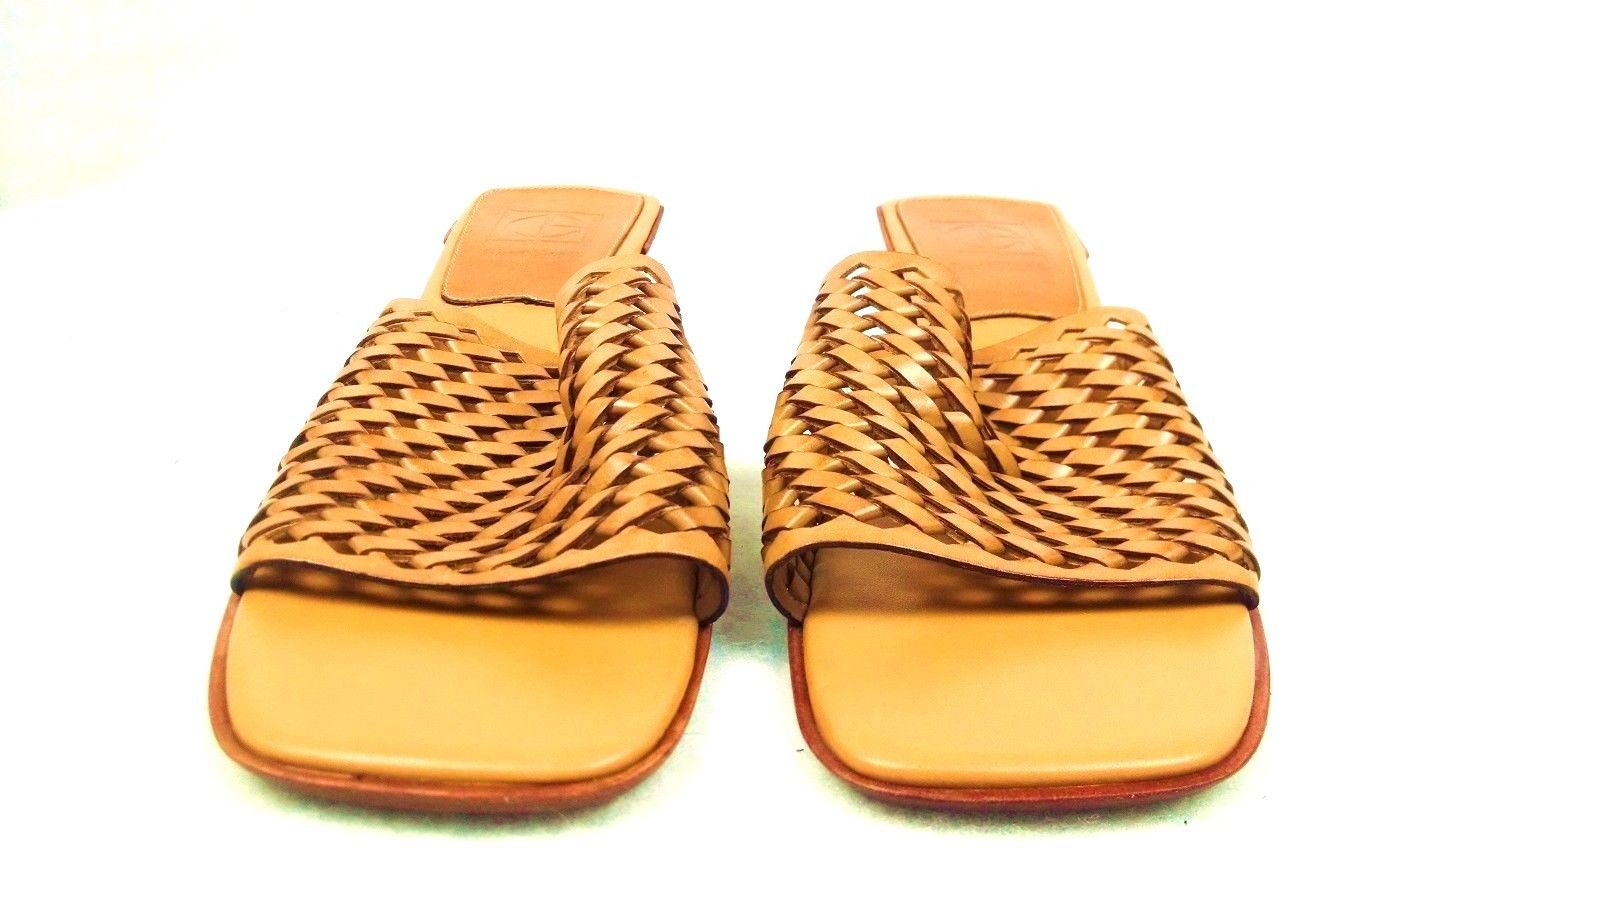 Cole Haan Womens Slides Sandals 9 1/2 B Pumps Heels Brazil Slip On Casual Summer